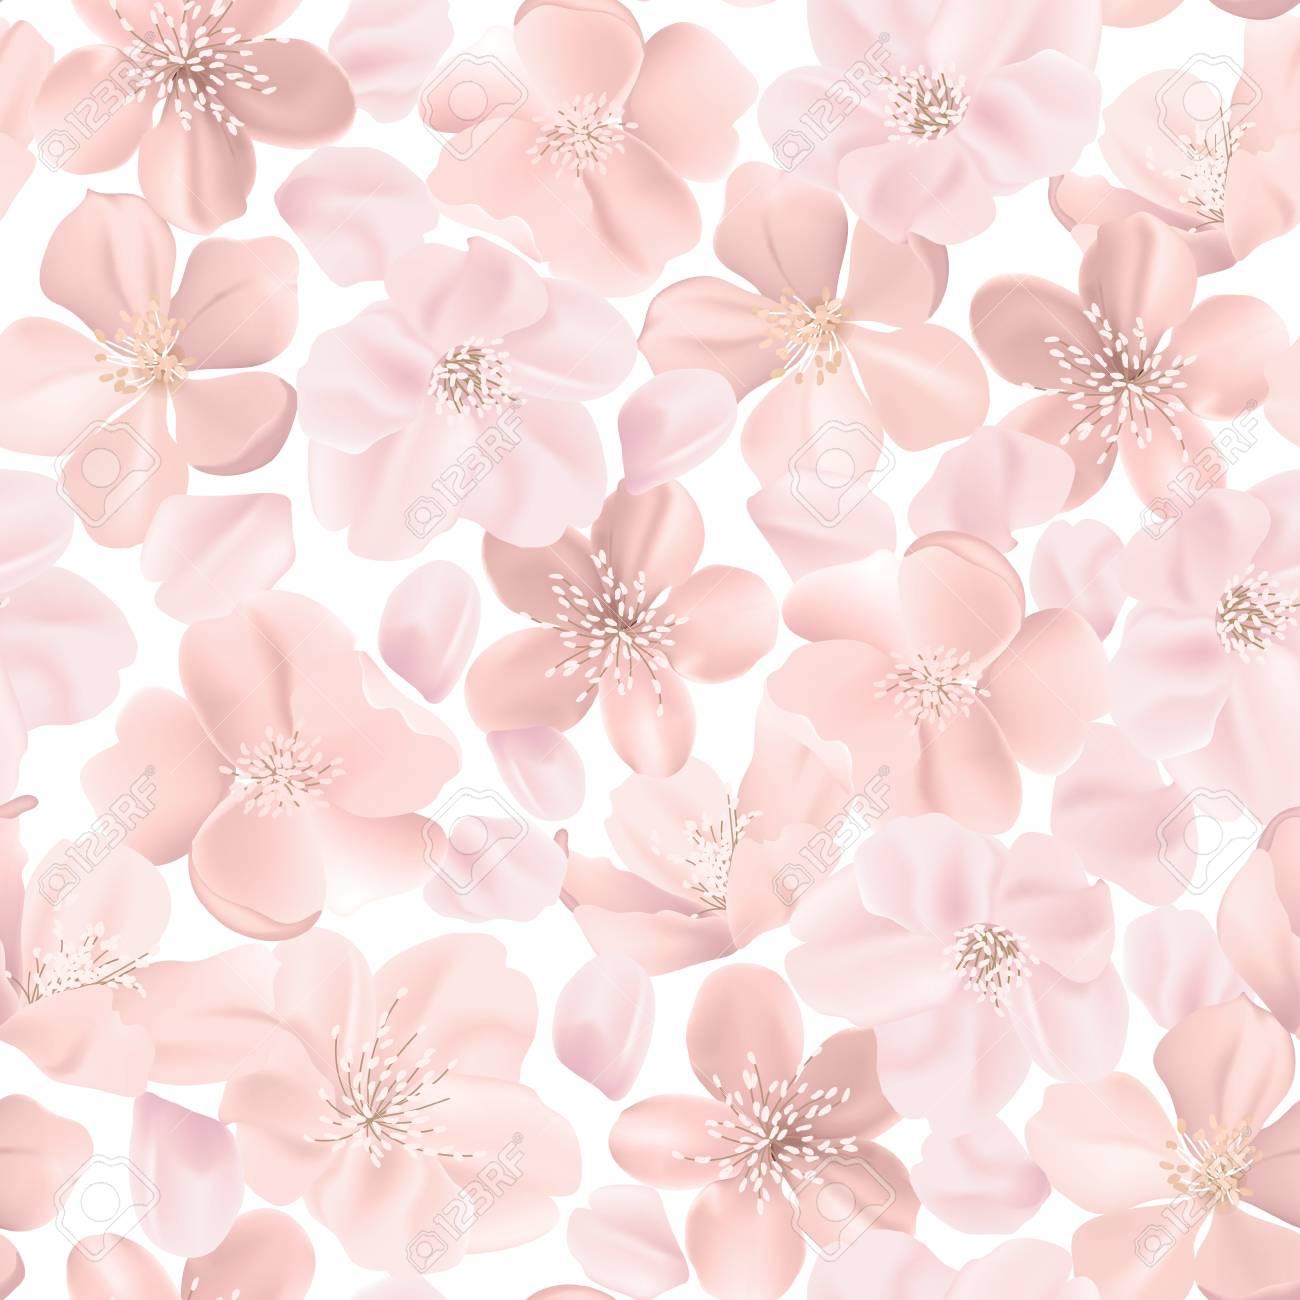 Floral Retro Seamless Pattern Cherry Or Sakura Flowers Background